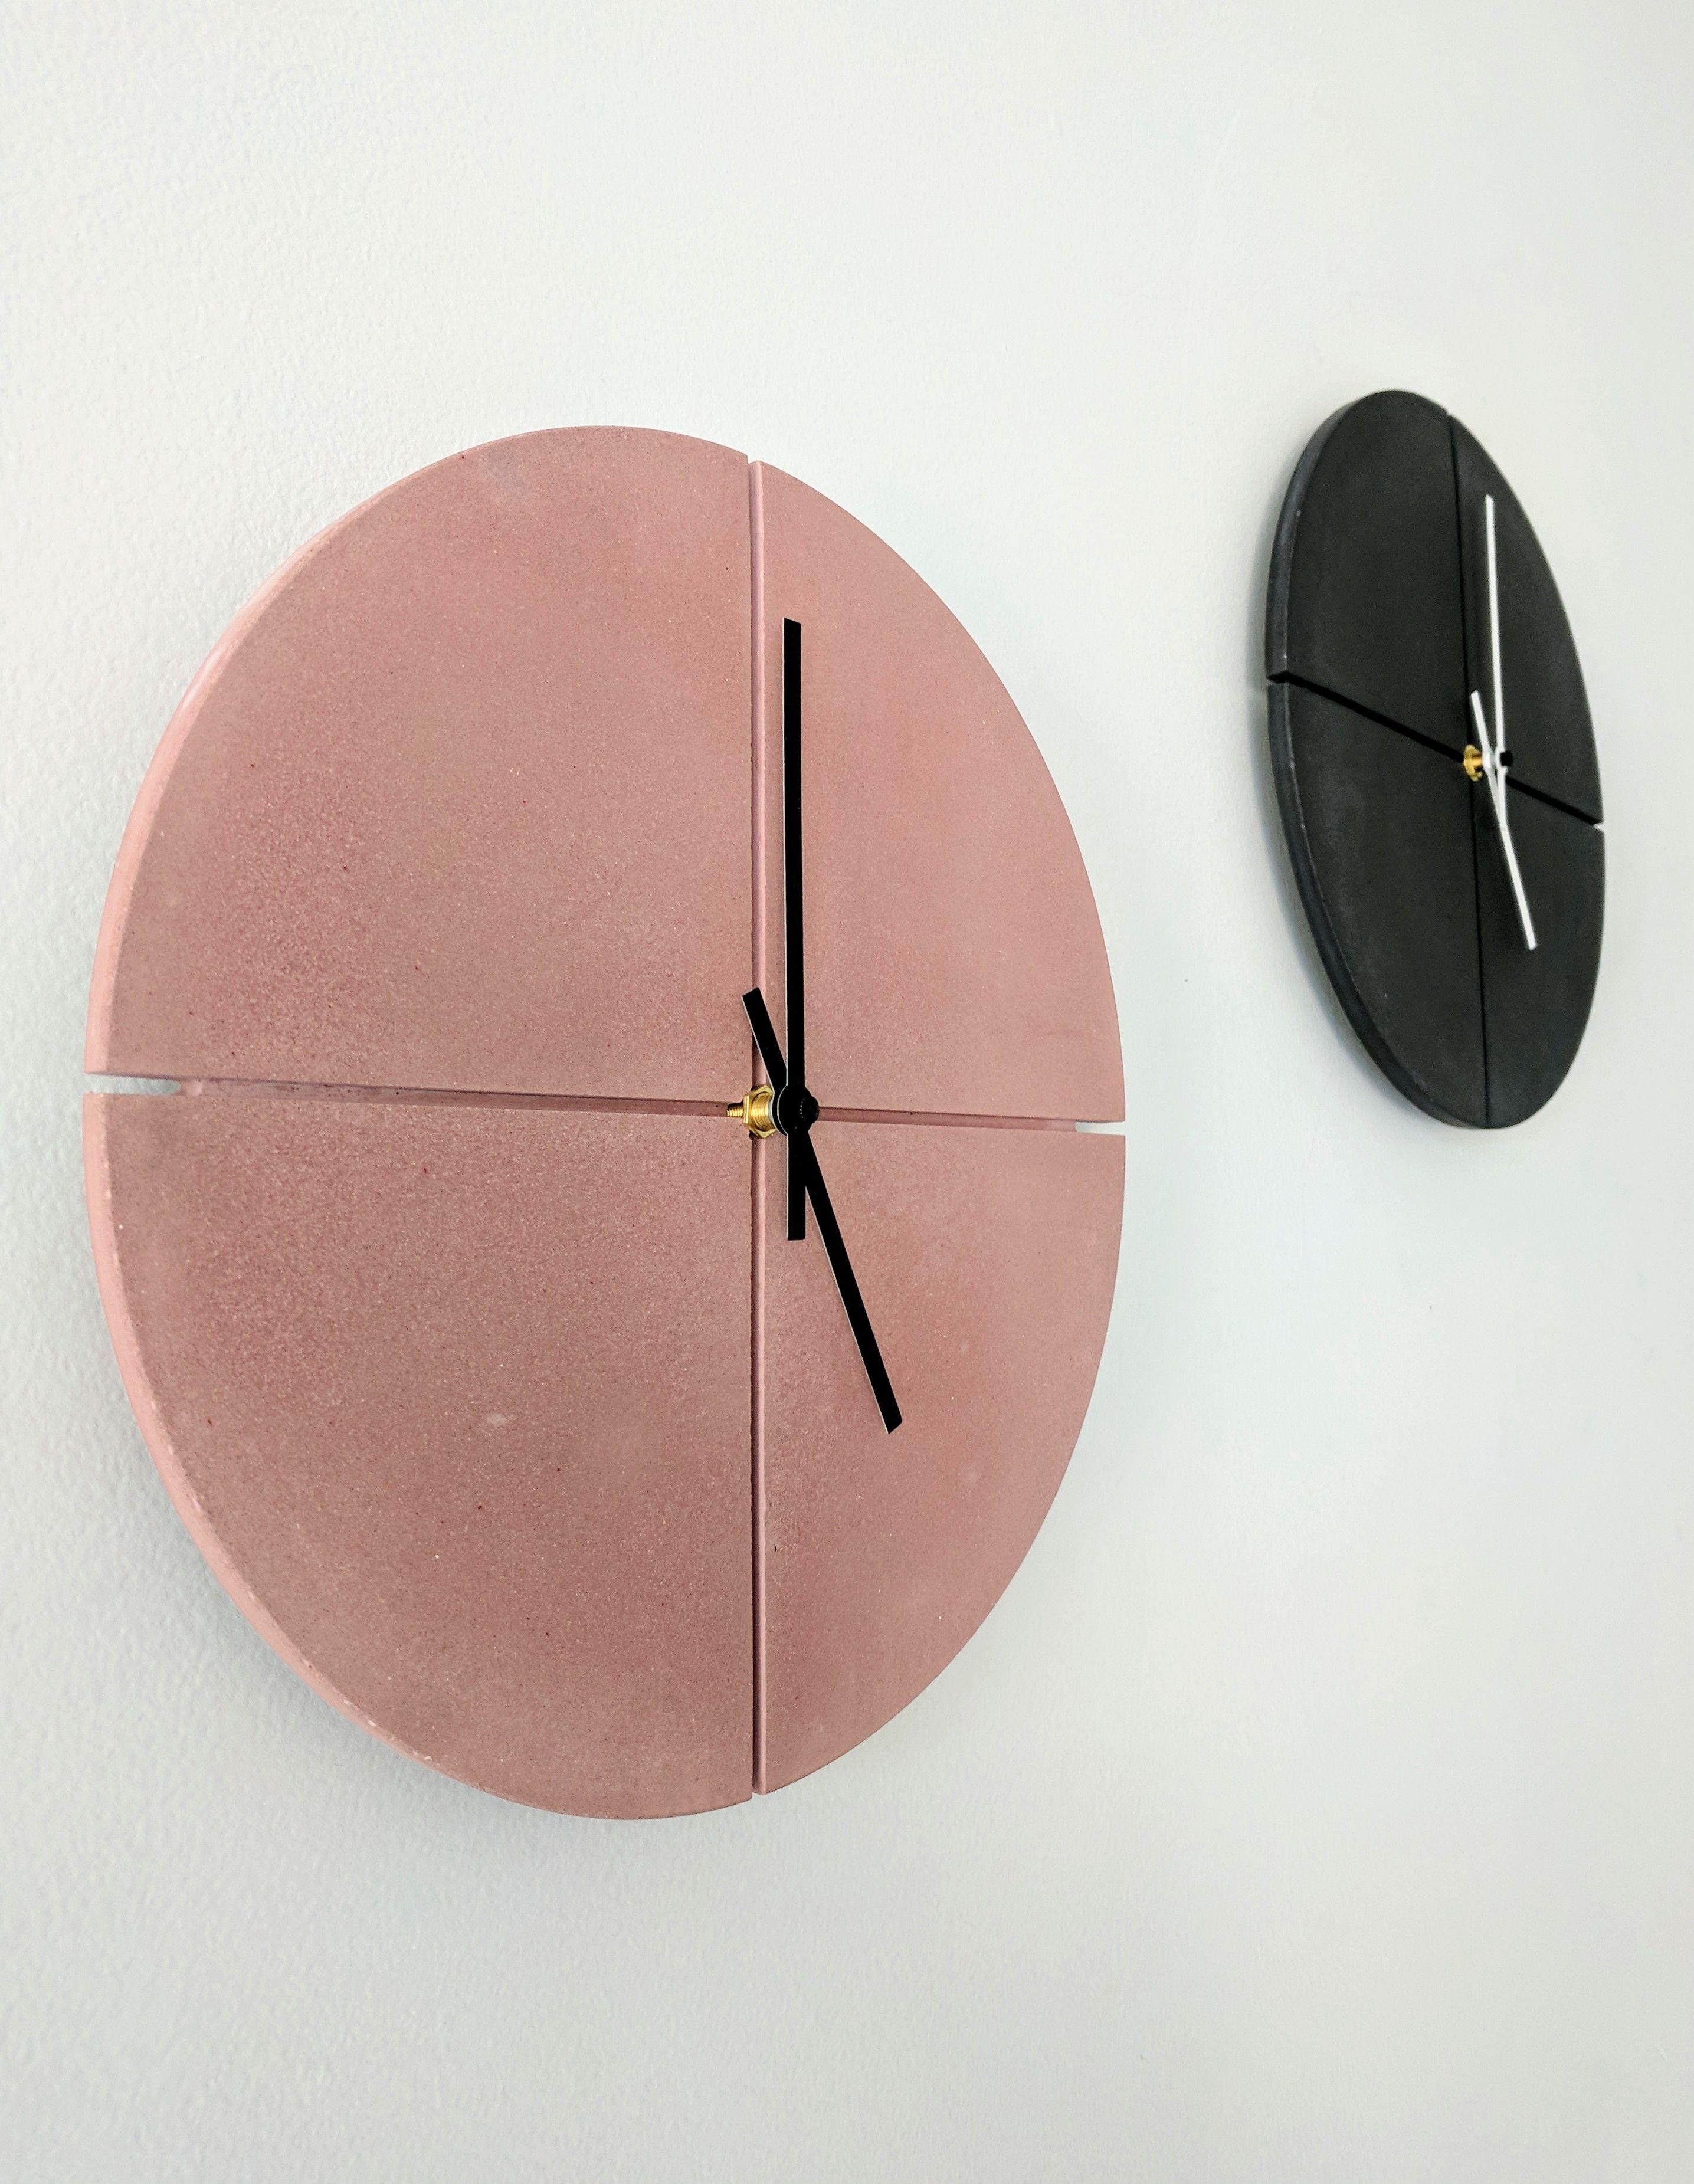 Modern Wall Clock 11 Concrete Clock Round Industrial Etsy In 2020 Handmade Home Decor Contemporary Clocks Wall Clock Modern